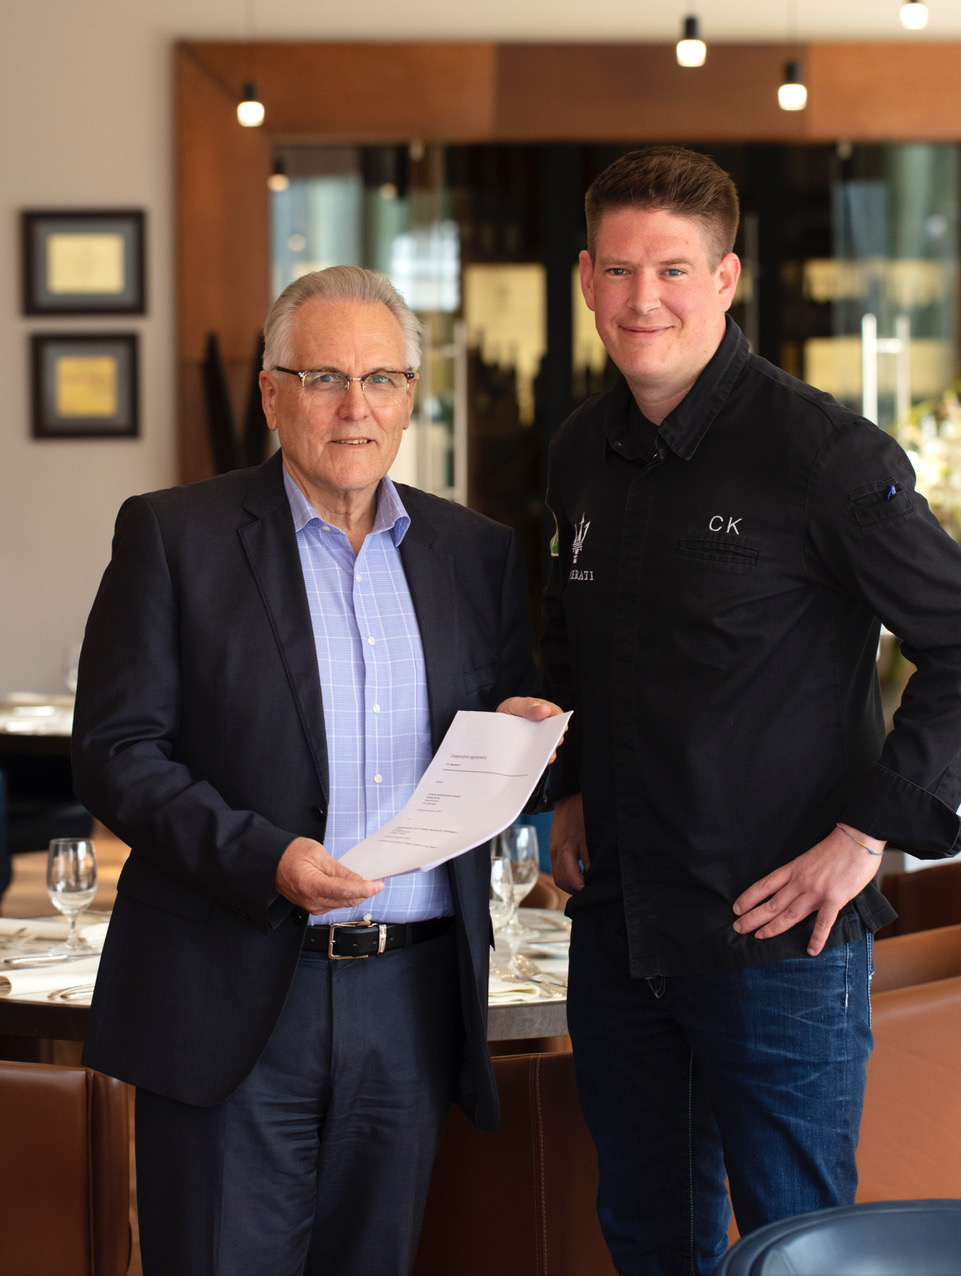 Schweizer Power in Kroatien: v.l.n.r. Peter Schoch, CEO der Lošinj Hotels & Villas sowie Spitzenkoch Christian Kuchler.